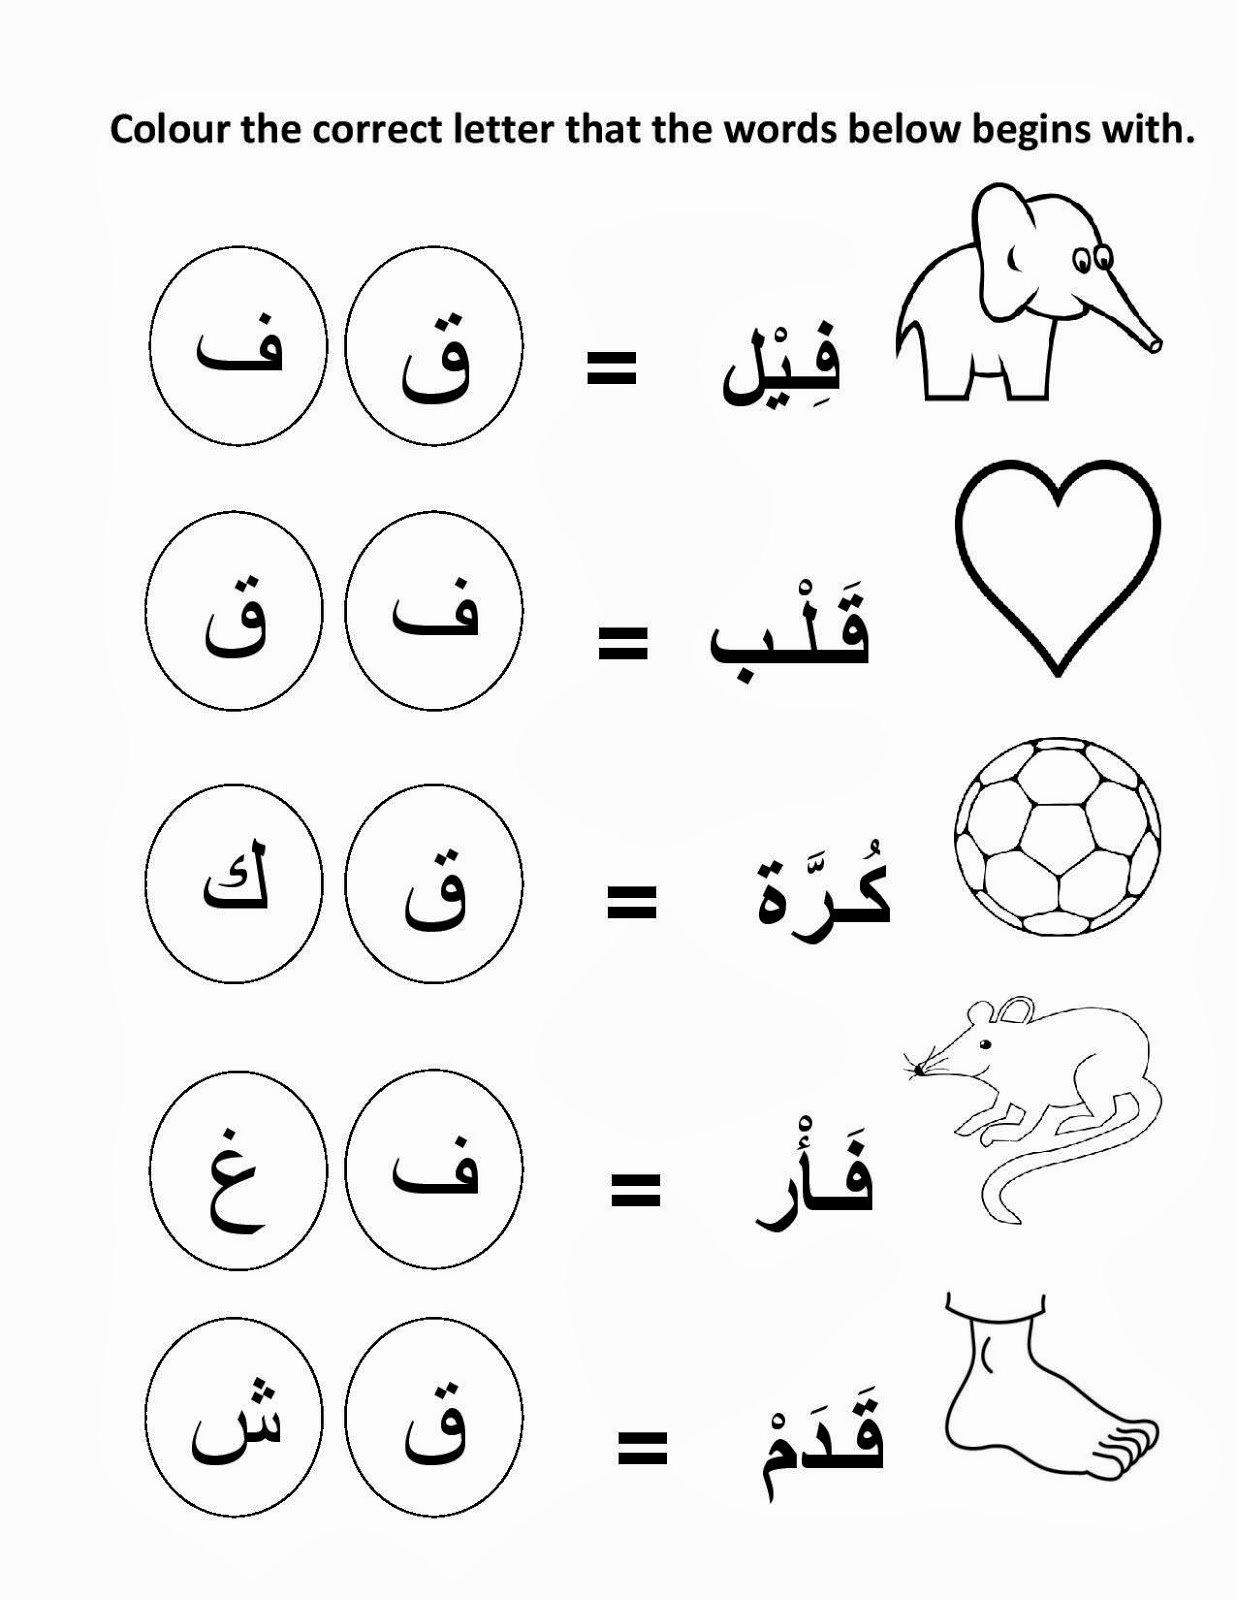 Arabic Worksheets for Preschoolers Best Of Worksheets Arabic Alphabet Letter Tracing Worksheets